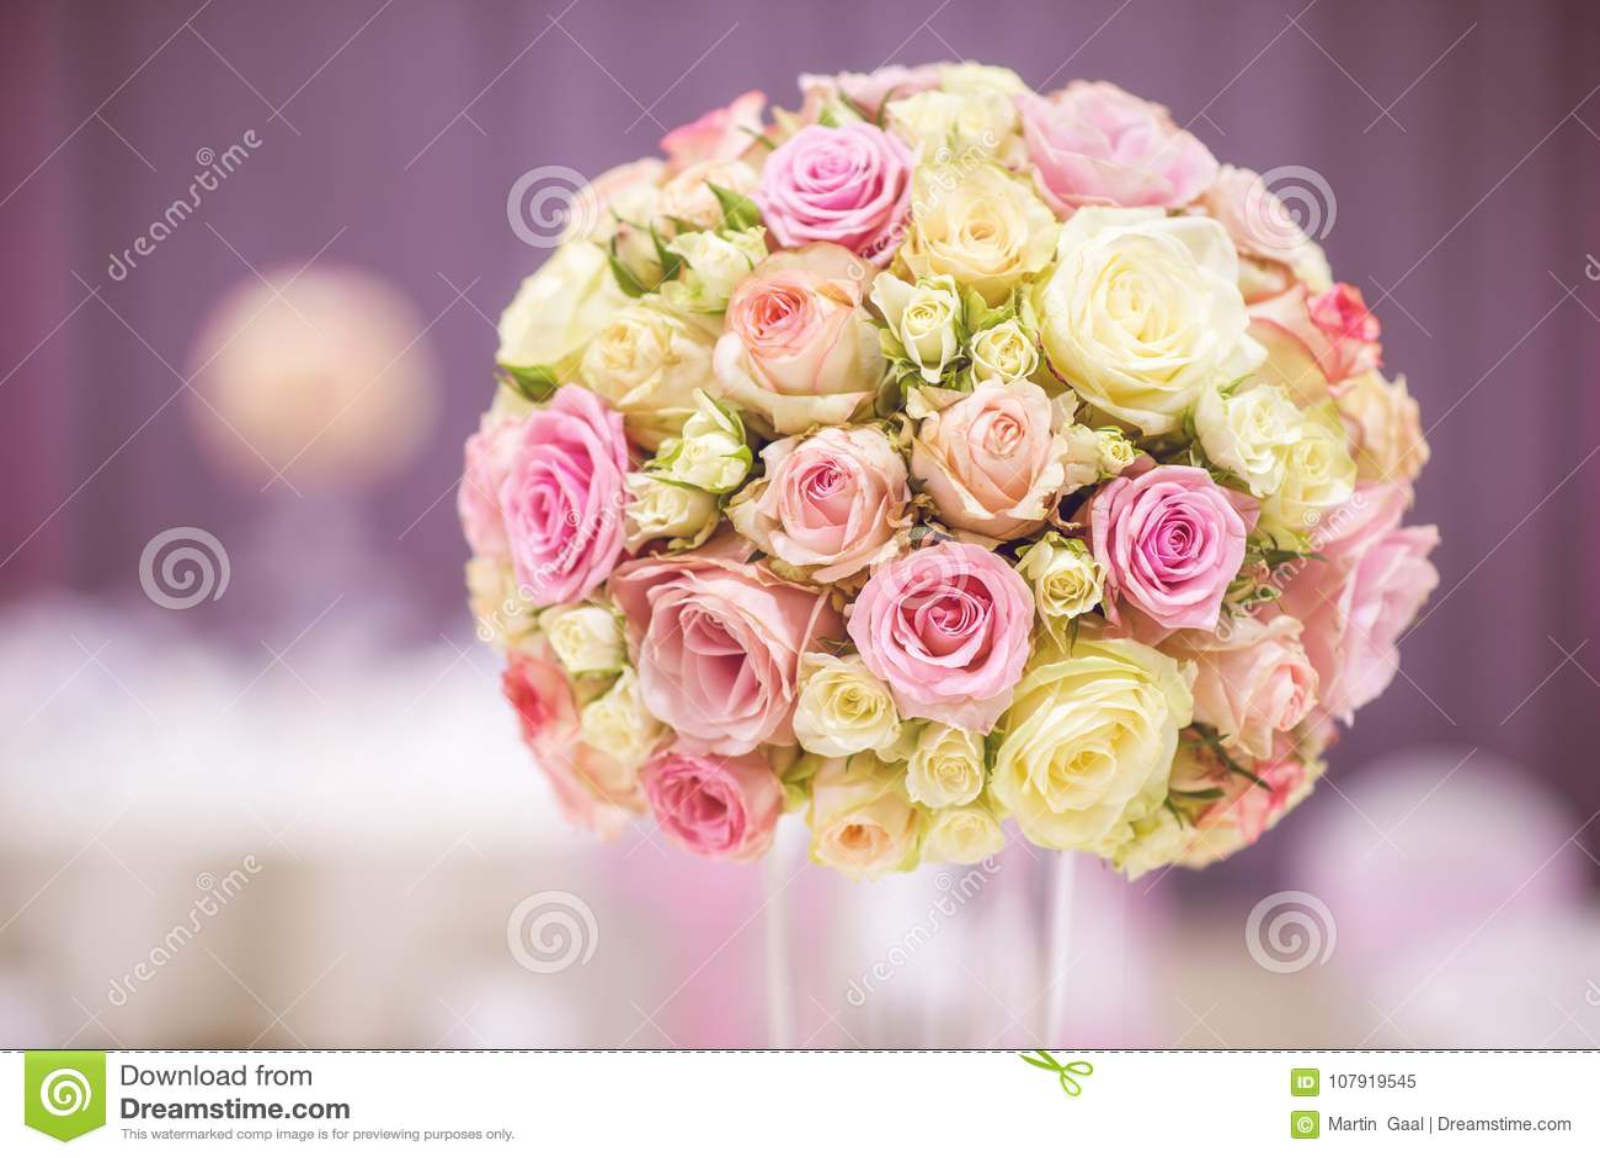 Luxury Floral Arrangement For Wedding Reception, Roses Flower ...